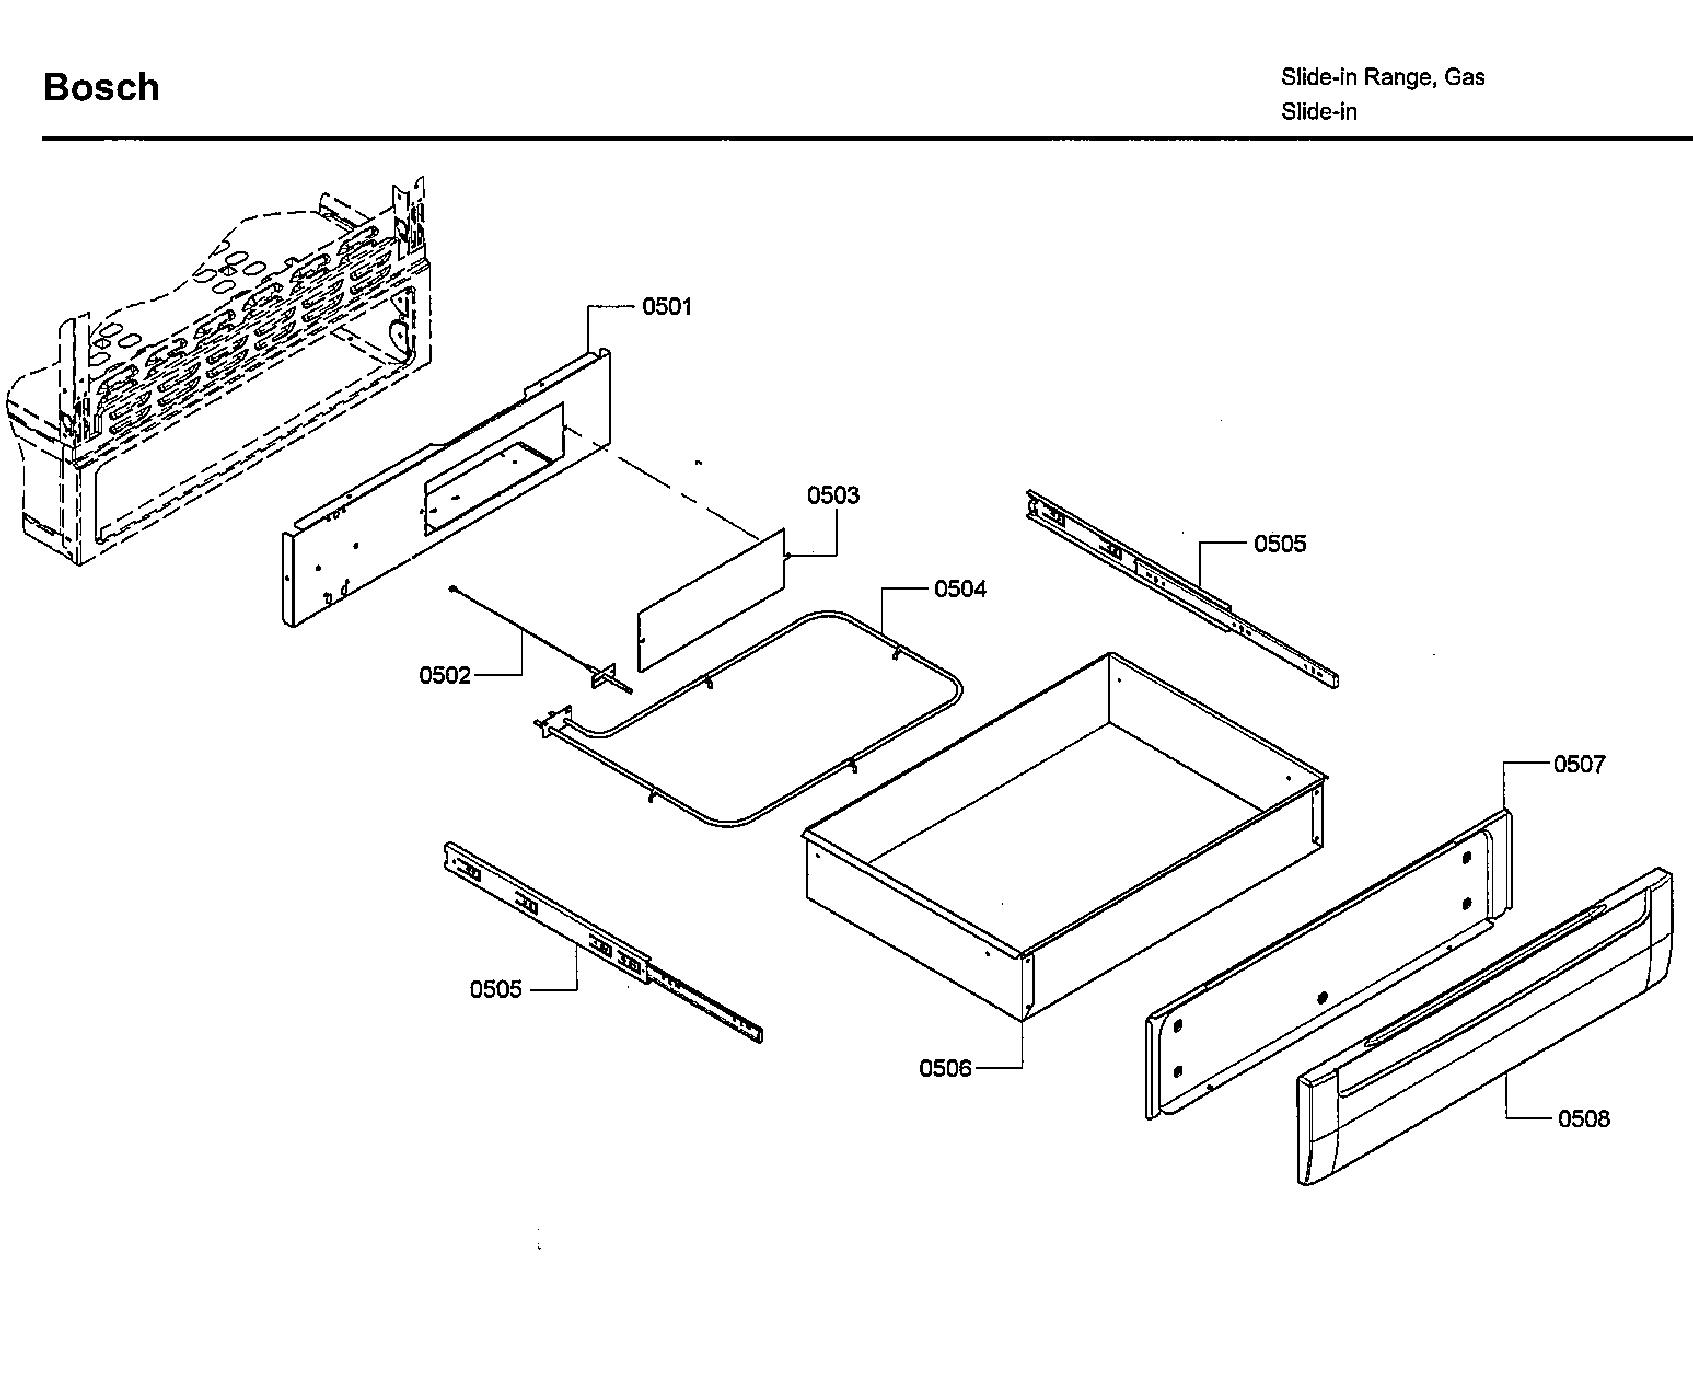 Bosch model HDI7282U/07 slide-in range, electric/gas